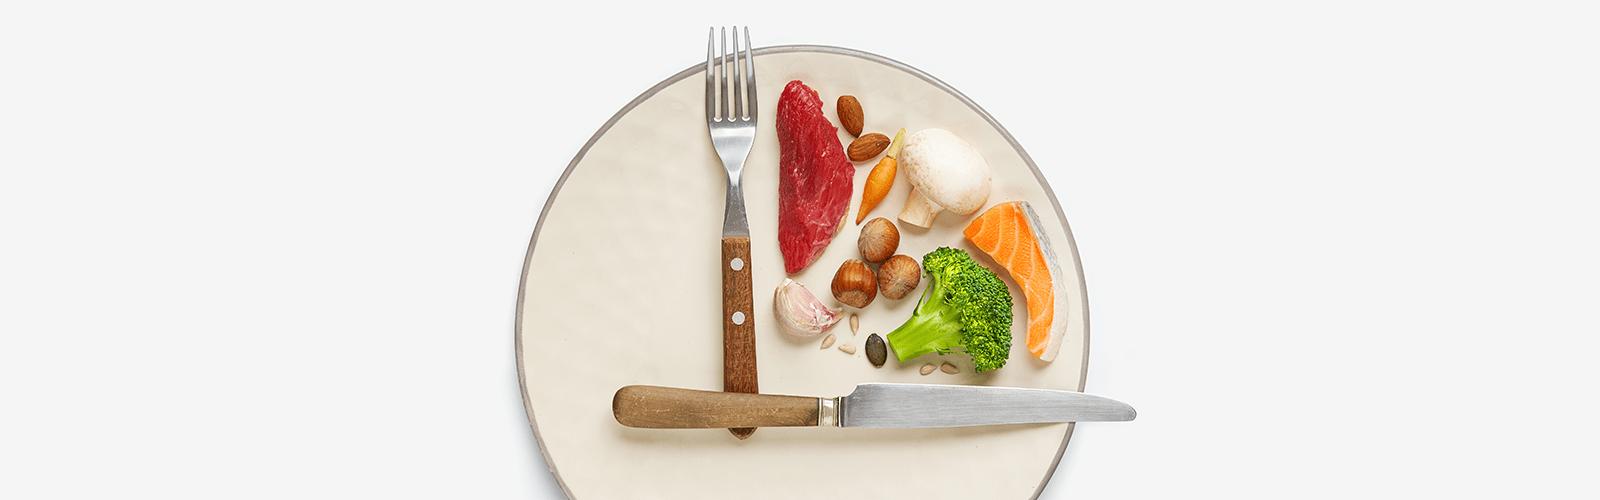 intermittent fasting glucose levels